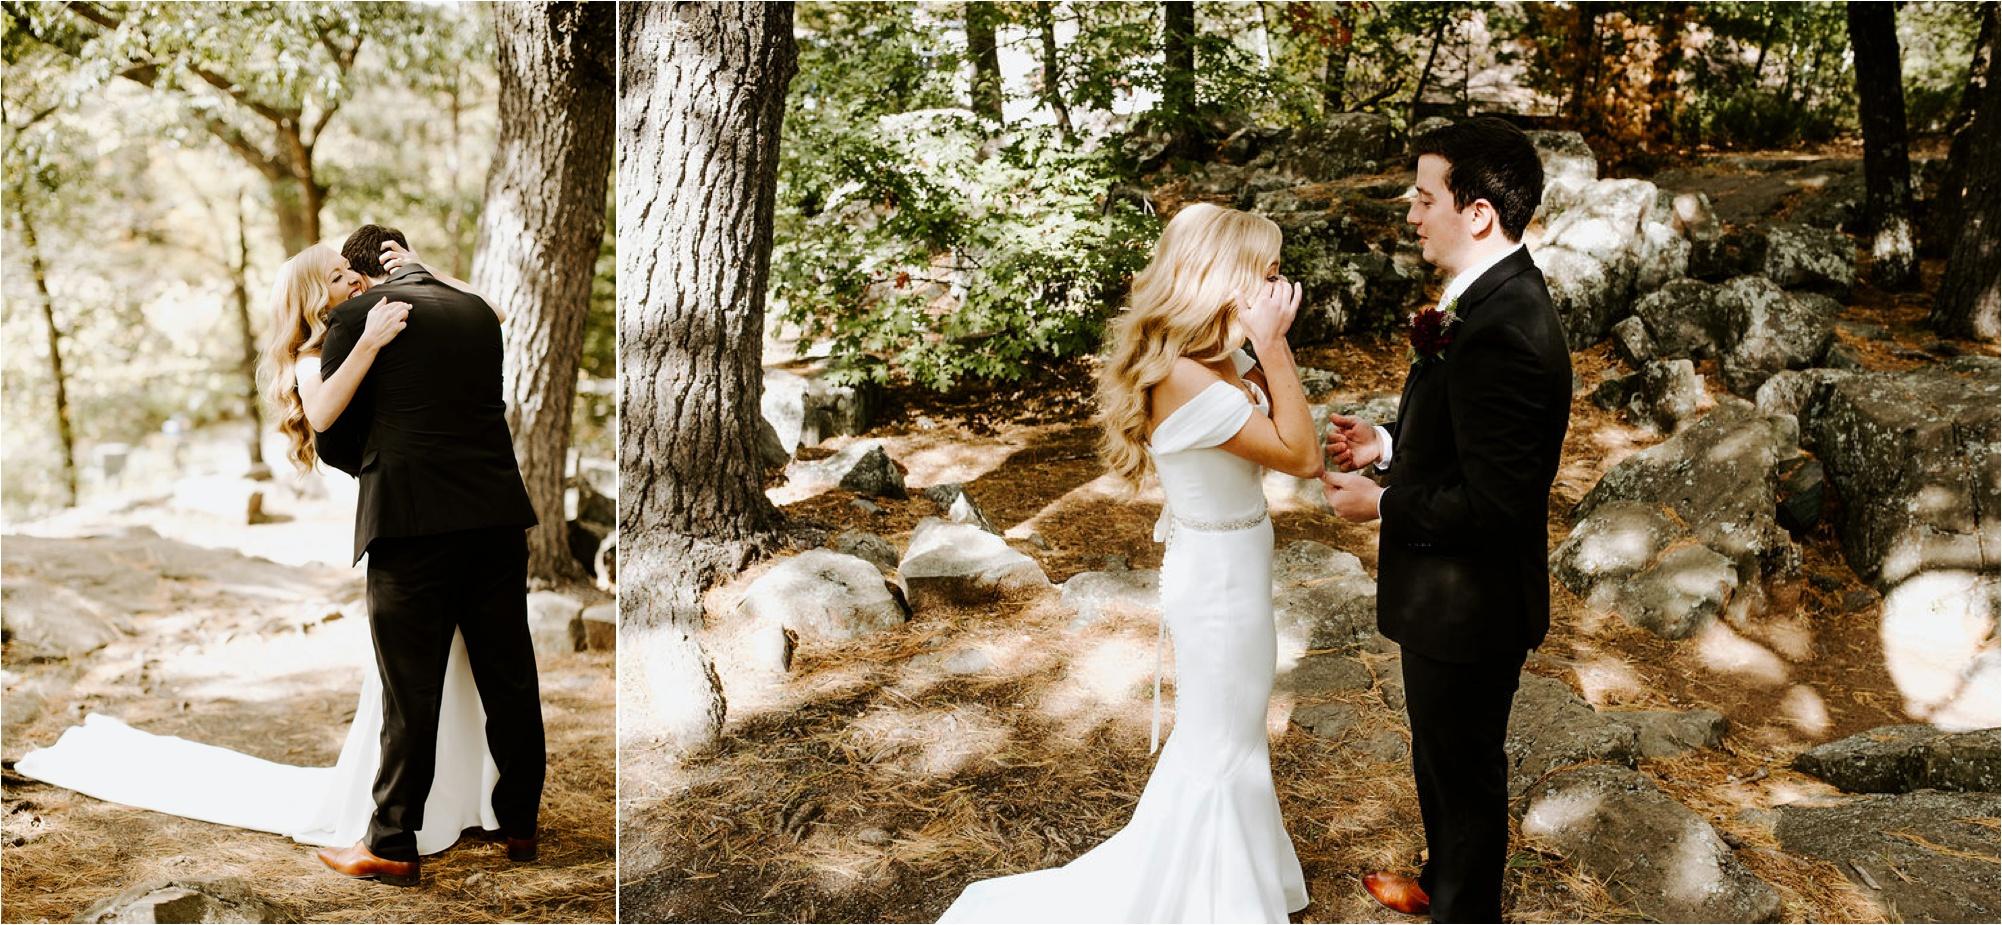 Winehaven Taylor's Falls Fall Wedding Minnesota Photographer_3860.jpg